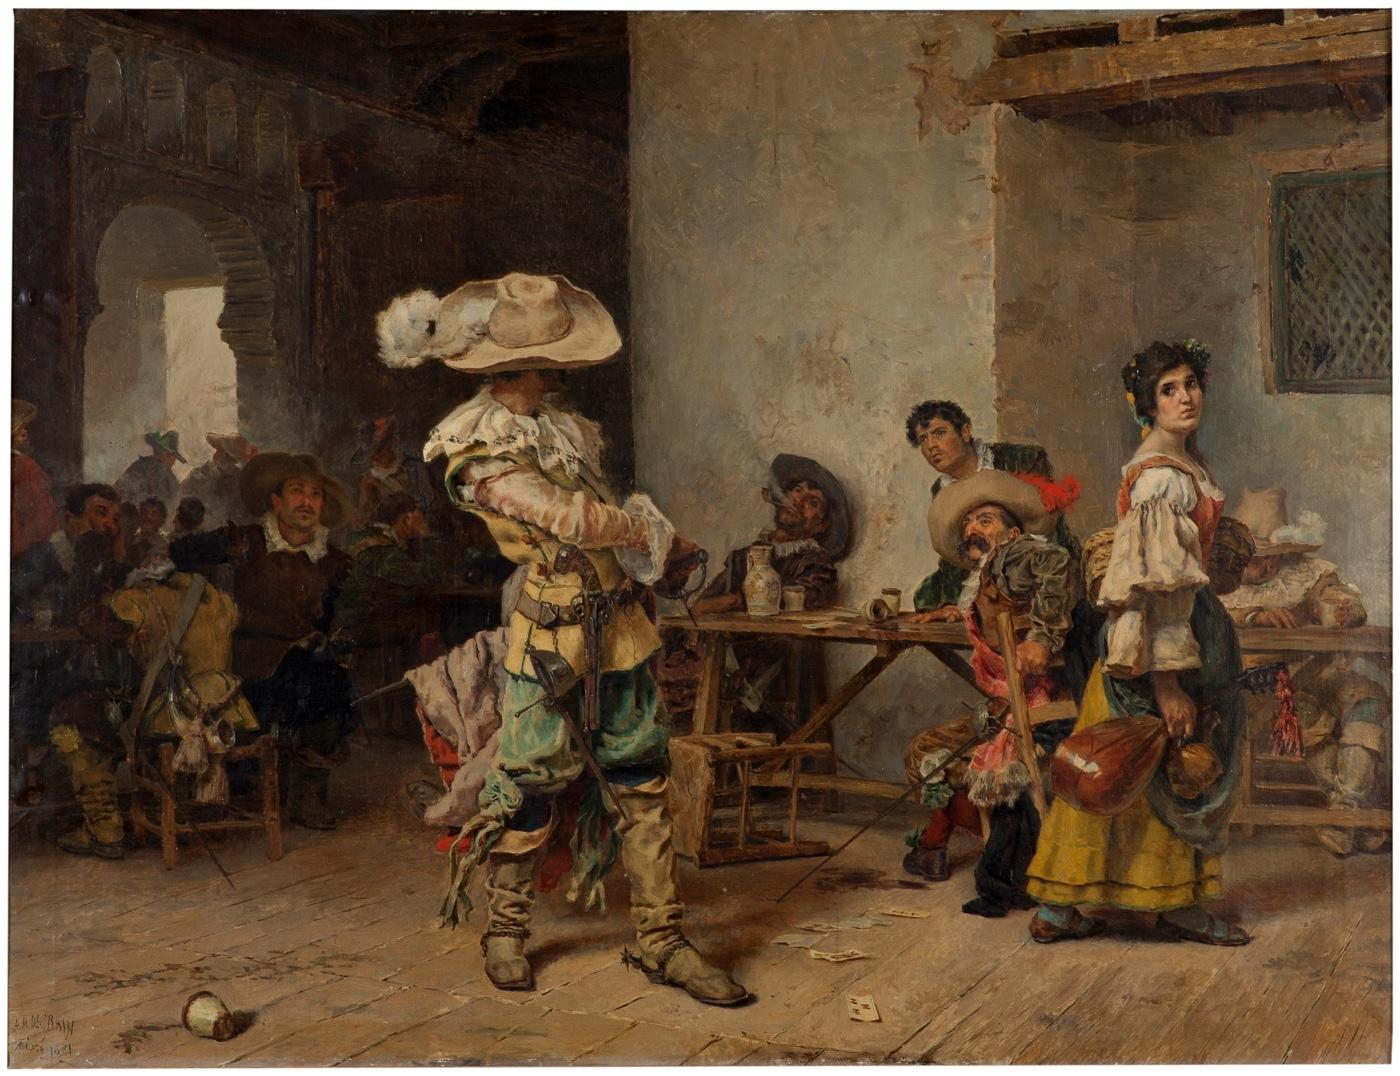 Un fanfarrón (1880), de Antonio Muñoz Degrain